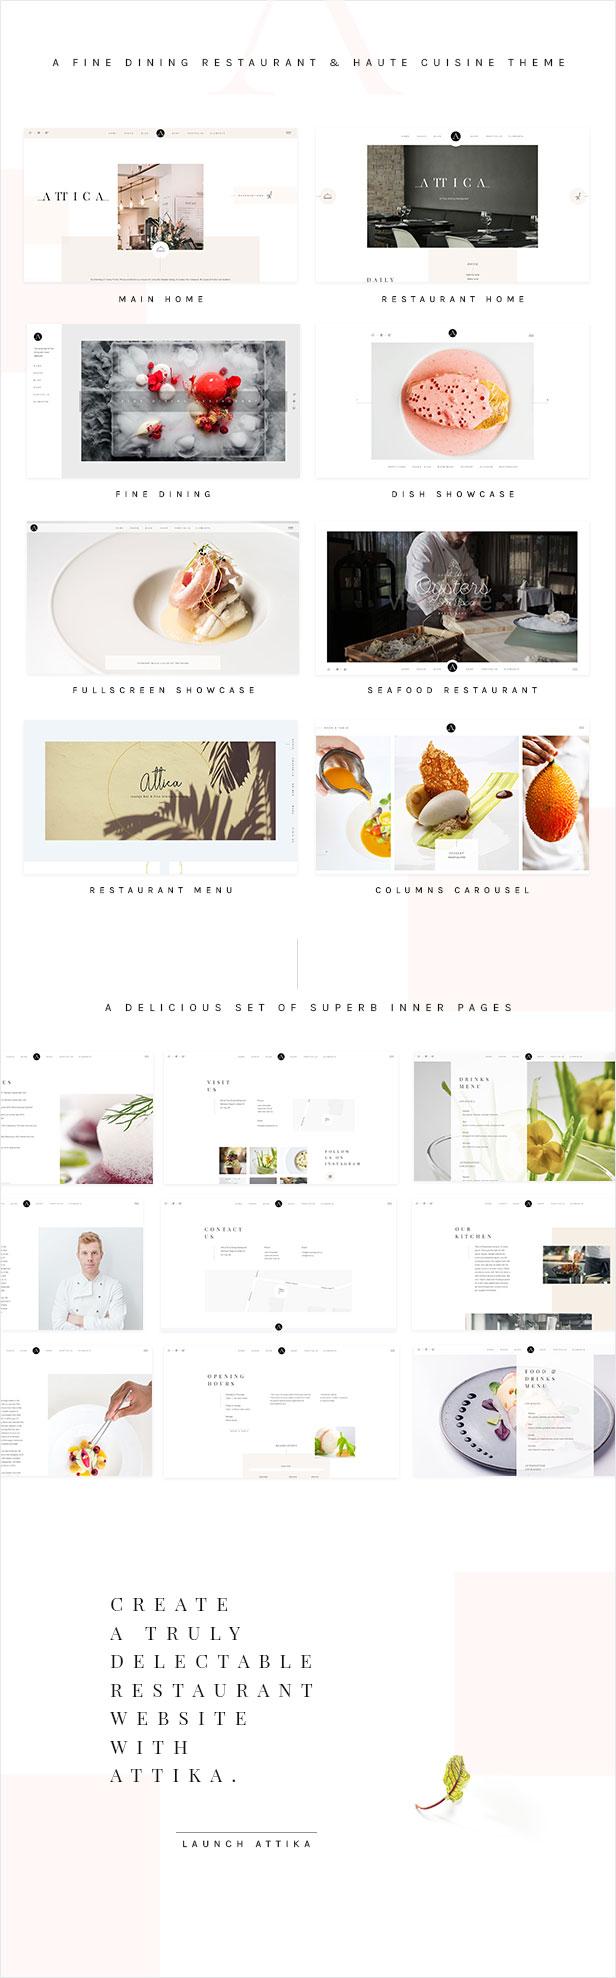 Attika - Elegant Theme for Fine Dining Restaurants - 1